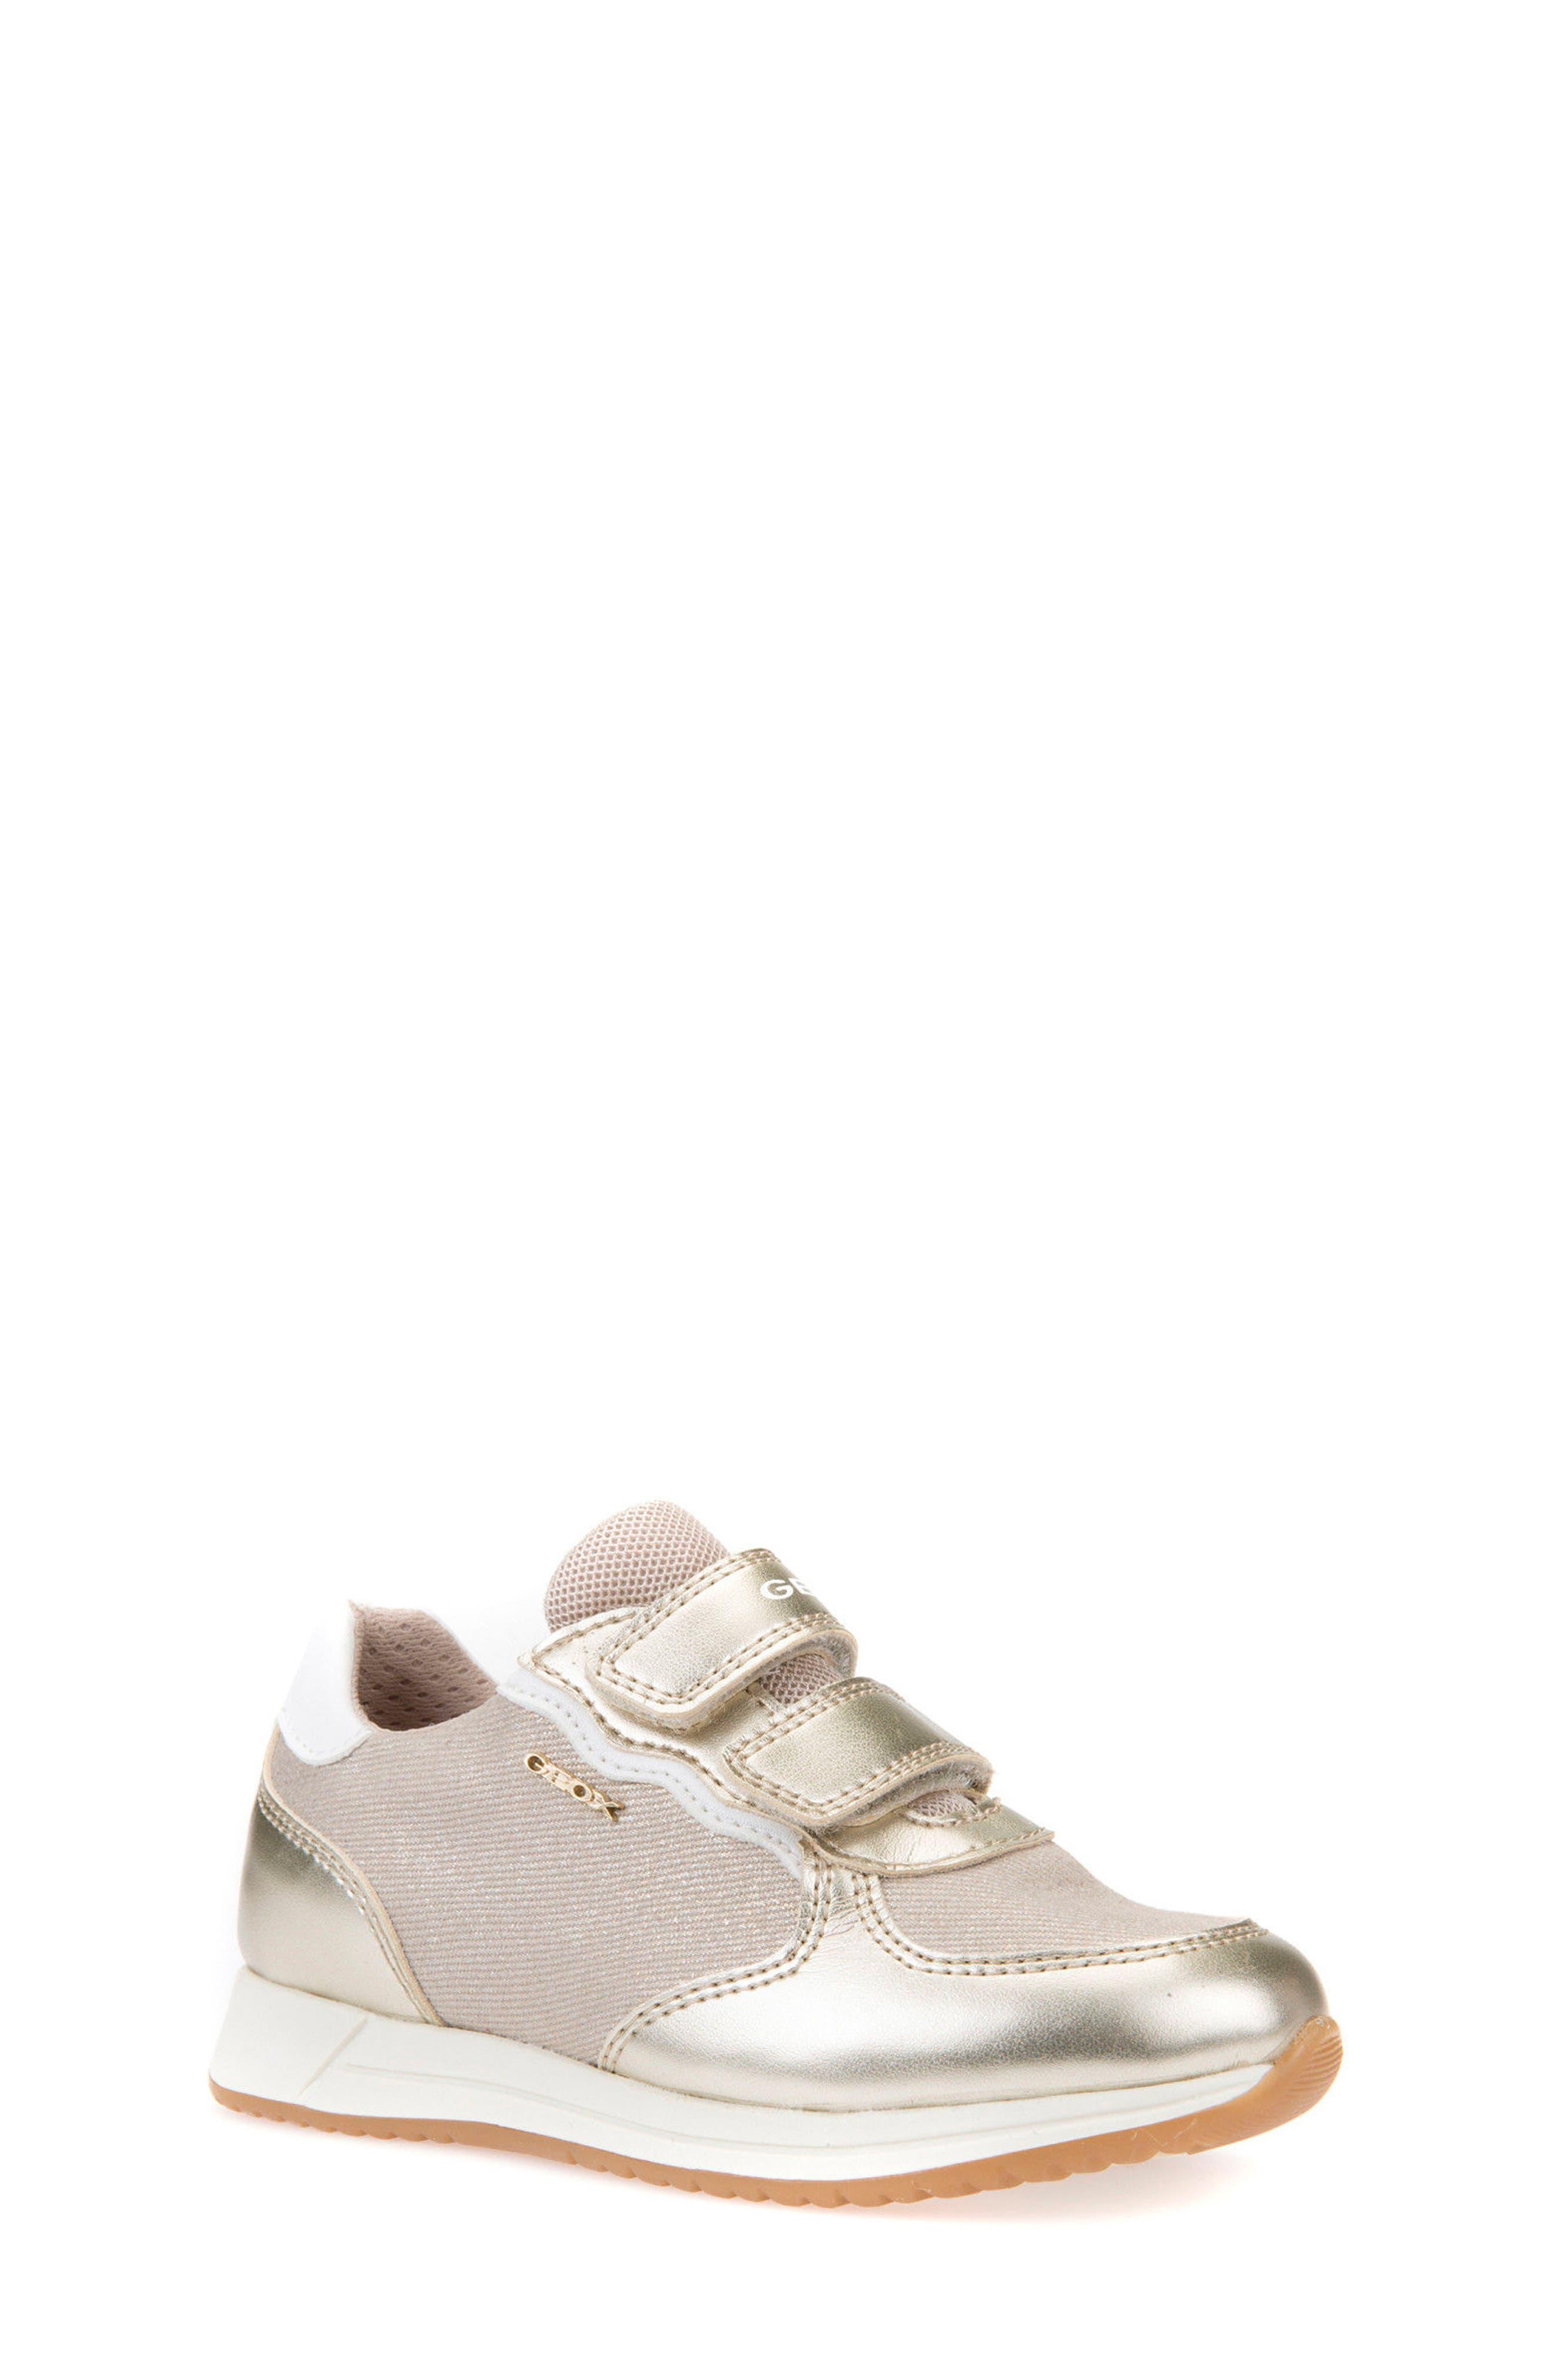 Jensea Metallic Accent Sneaker,                             Main thumbnail 1, color,                             BEIGE/ LIGHT GOLD